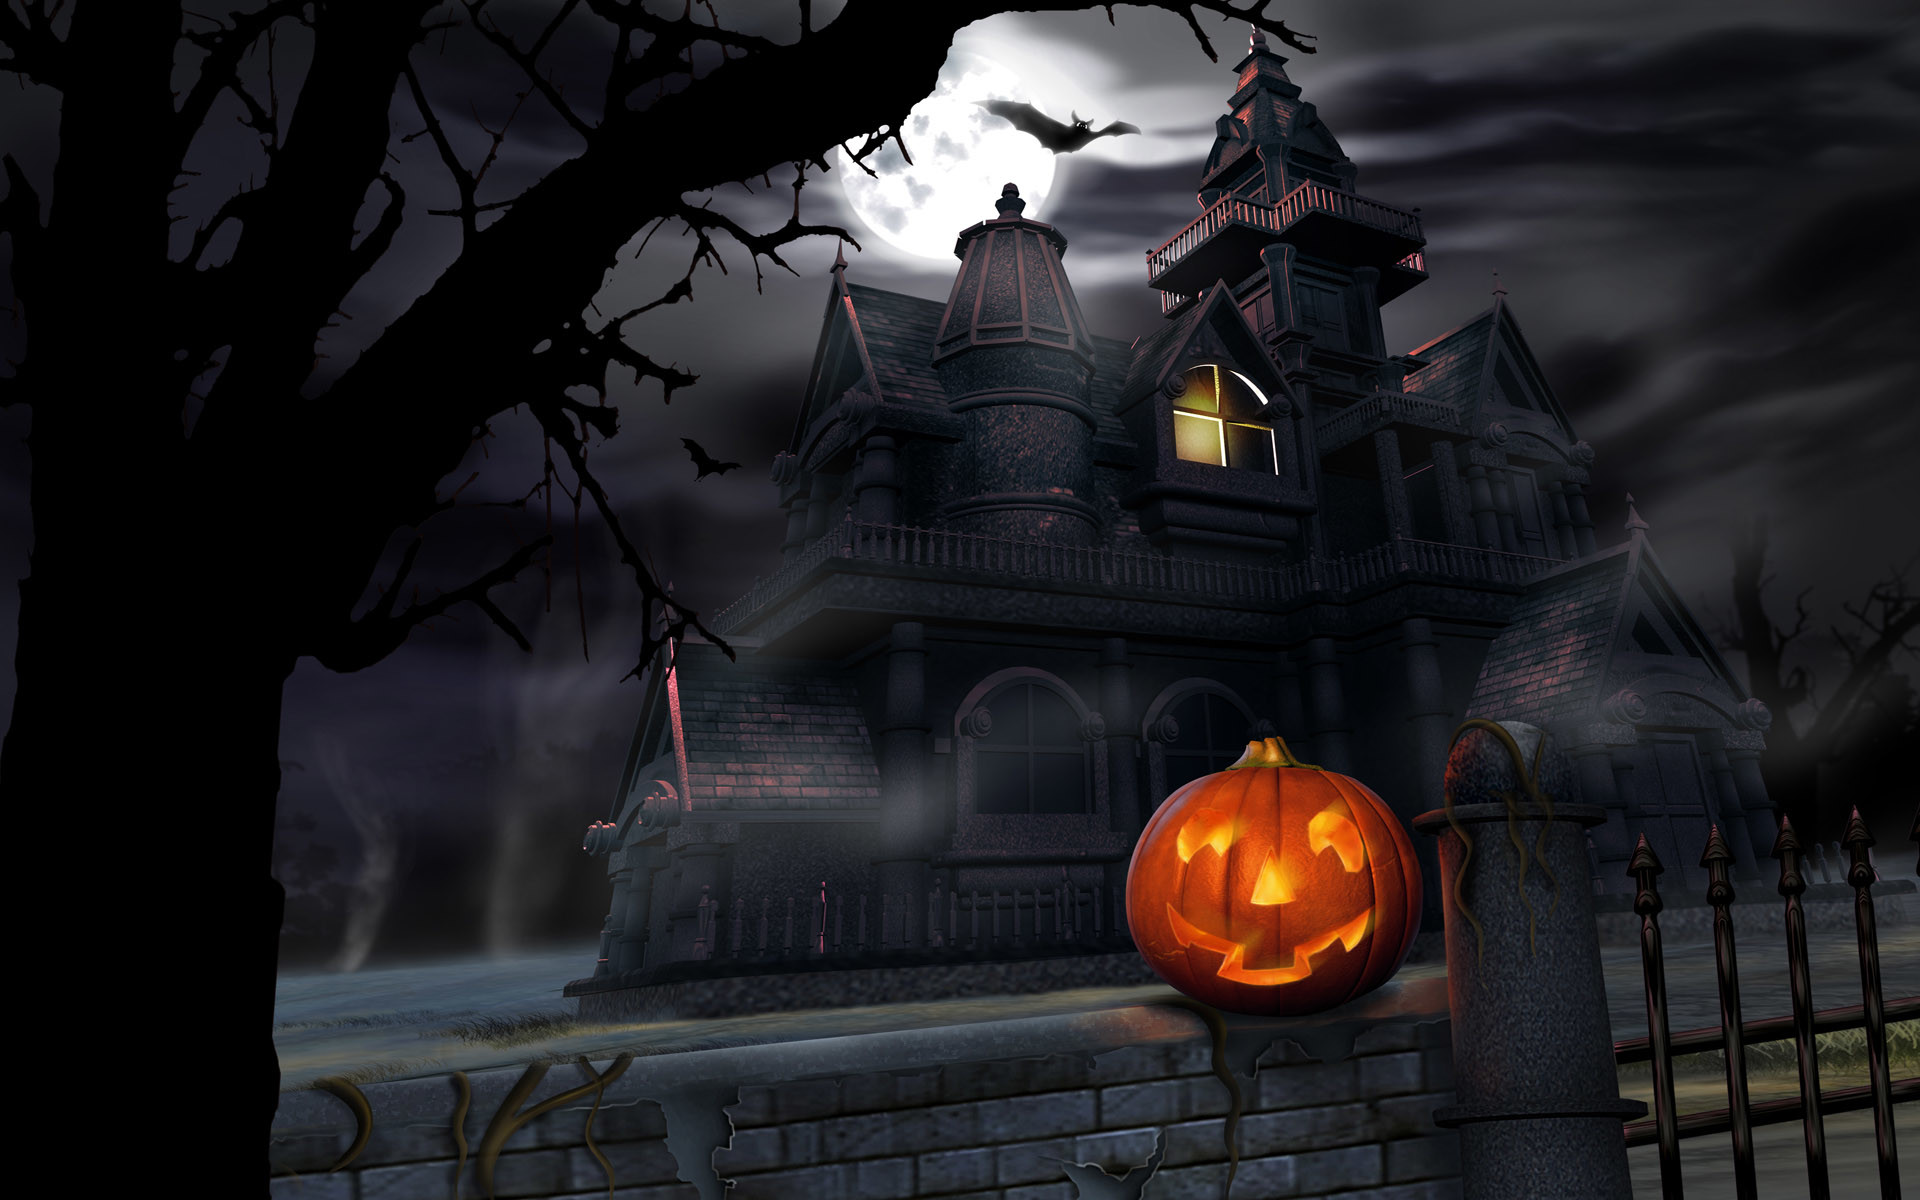 Scary-Halloween-2012-Pumpkin-HD-Wallpaper-2